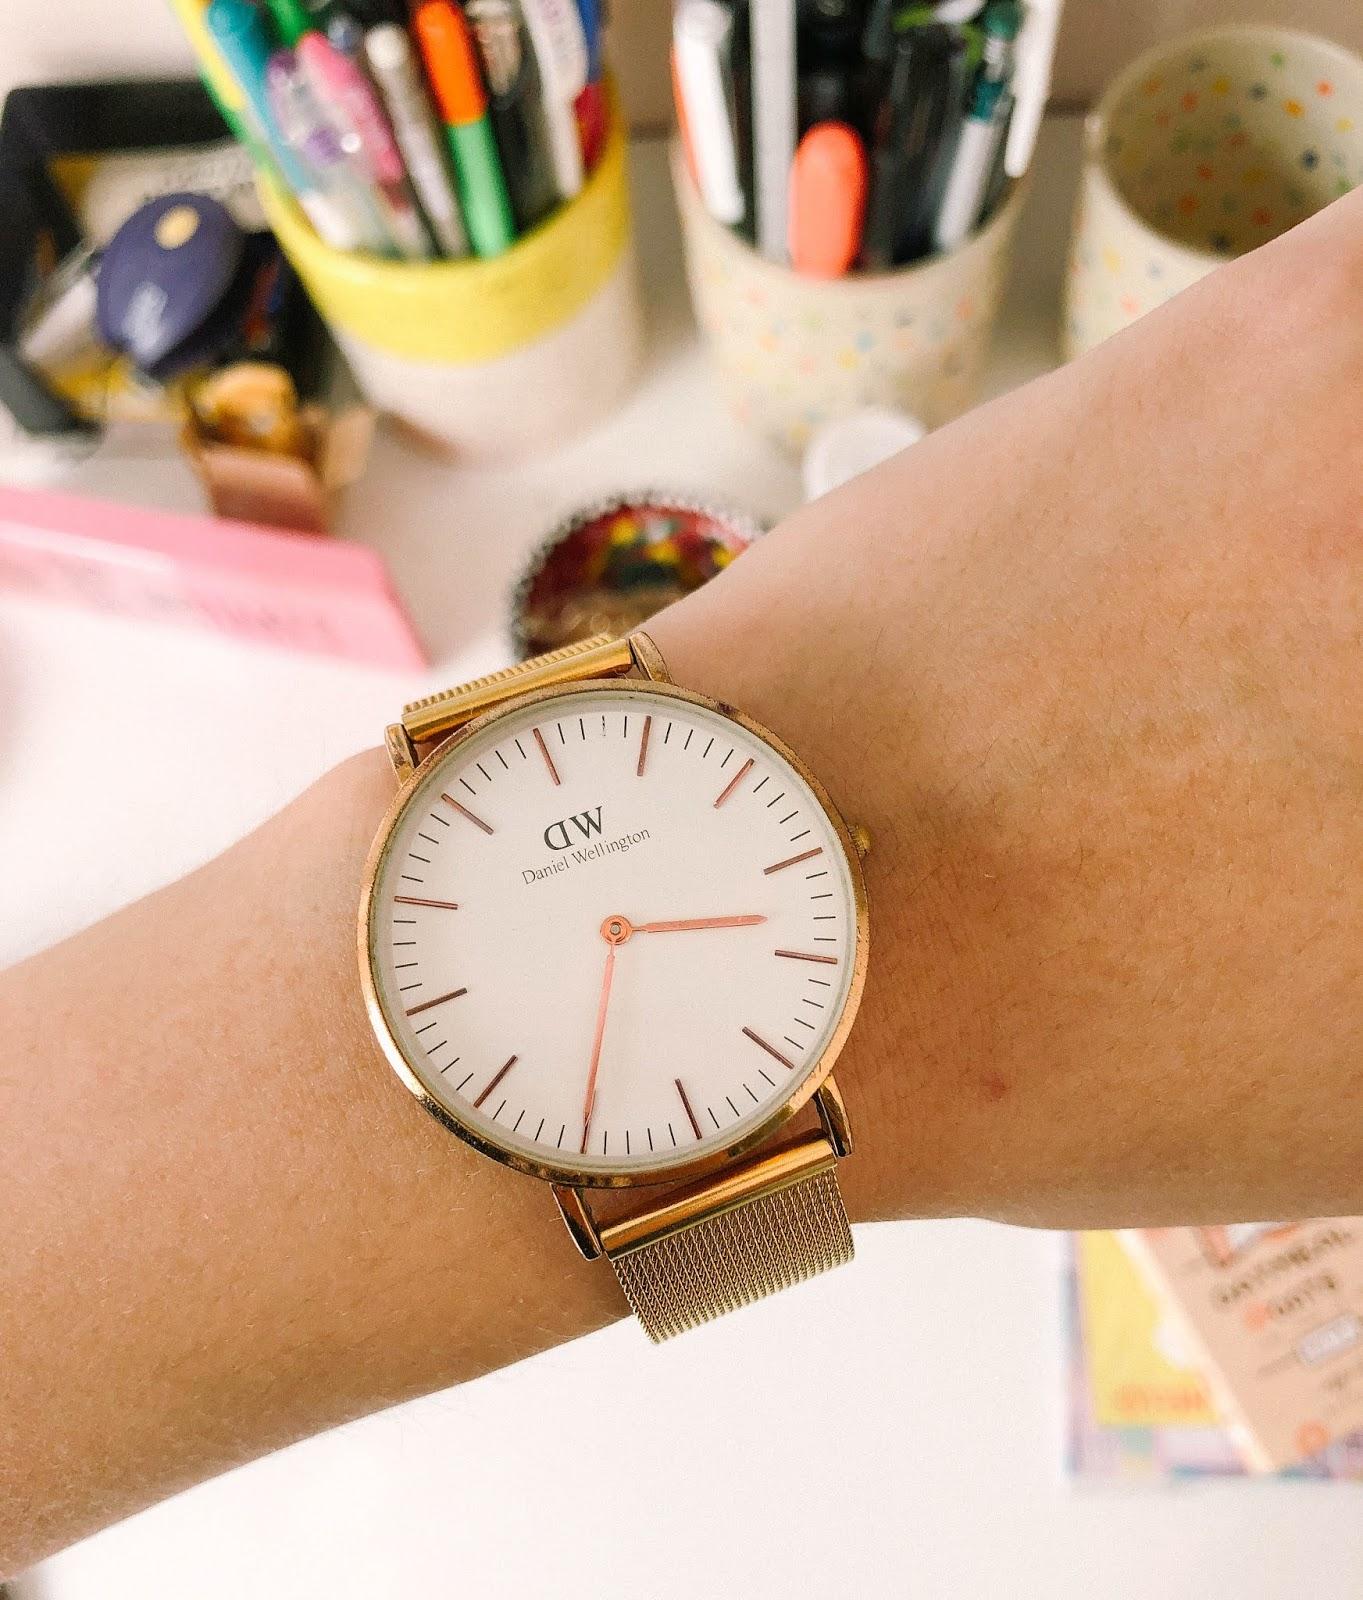 teto Aliexpress stationery products haul review selection  - daniel Wellington watch strap aliexpress